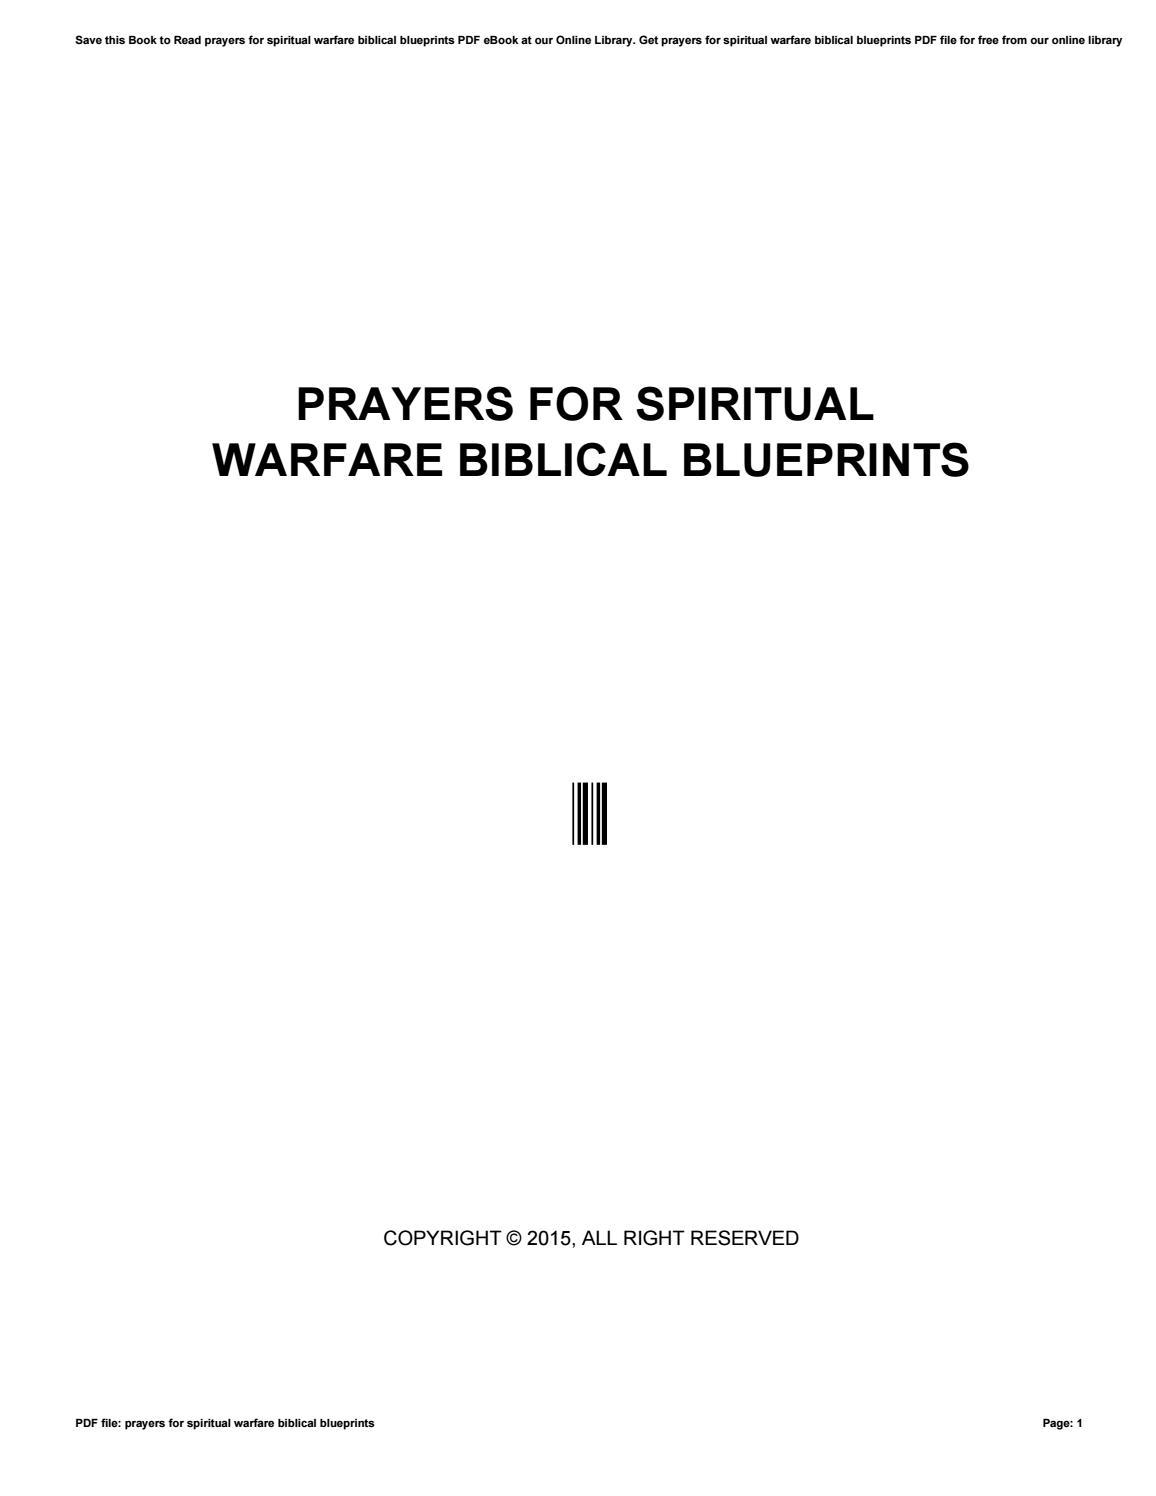 Prayers for spiritual warfare biblical blueprints by minex-coin29